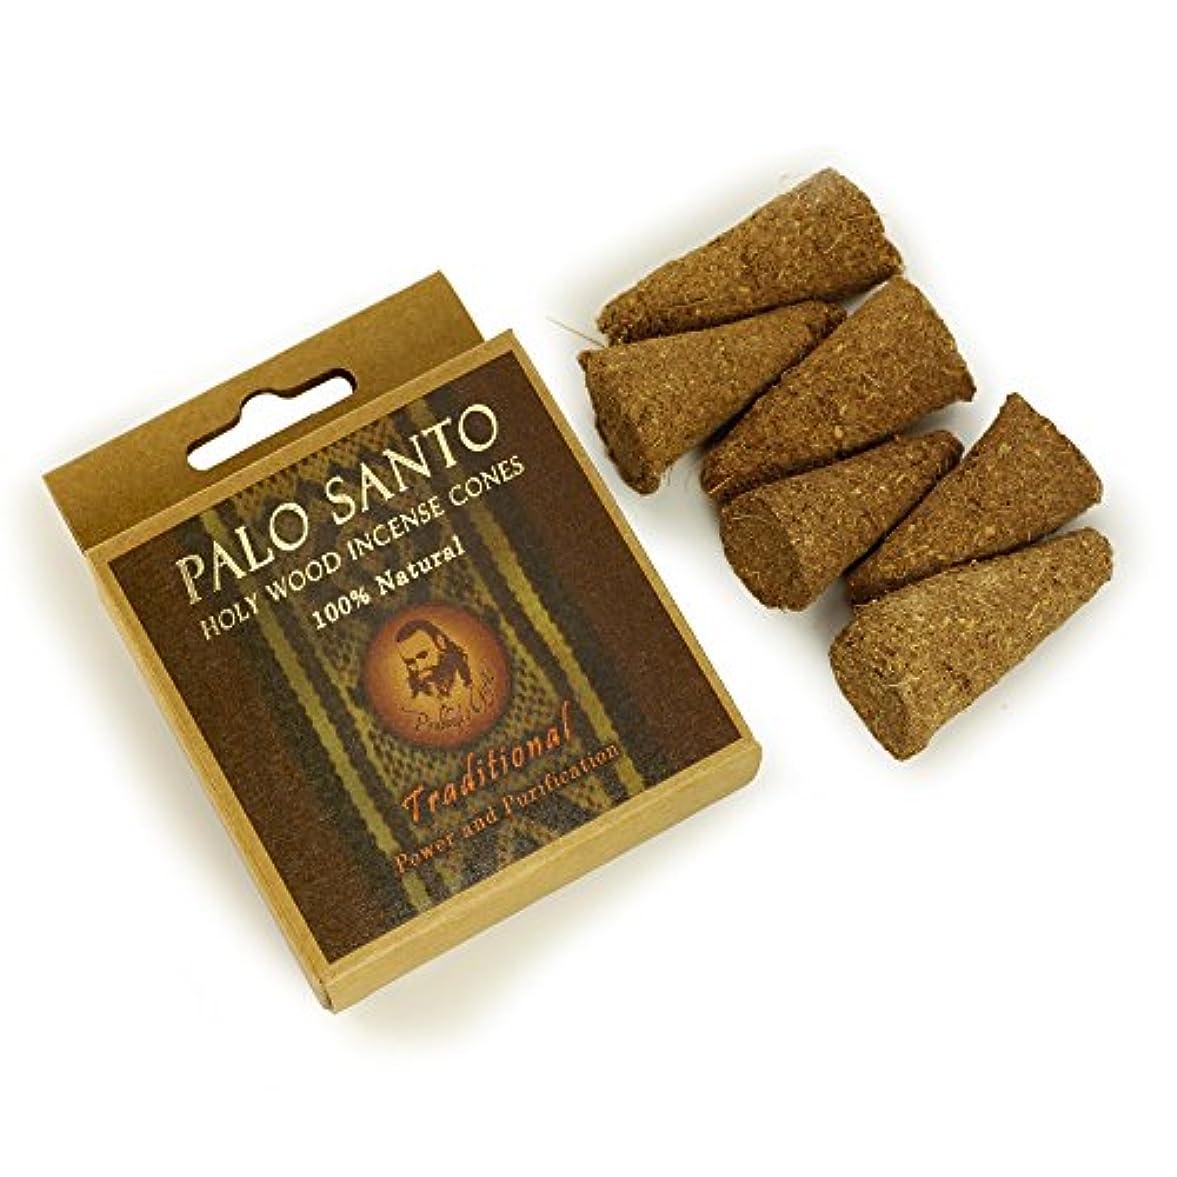 Palo Santo Traditional – 電源& Purification – 6 Incense Cones